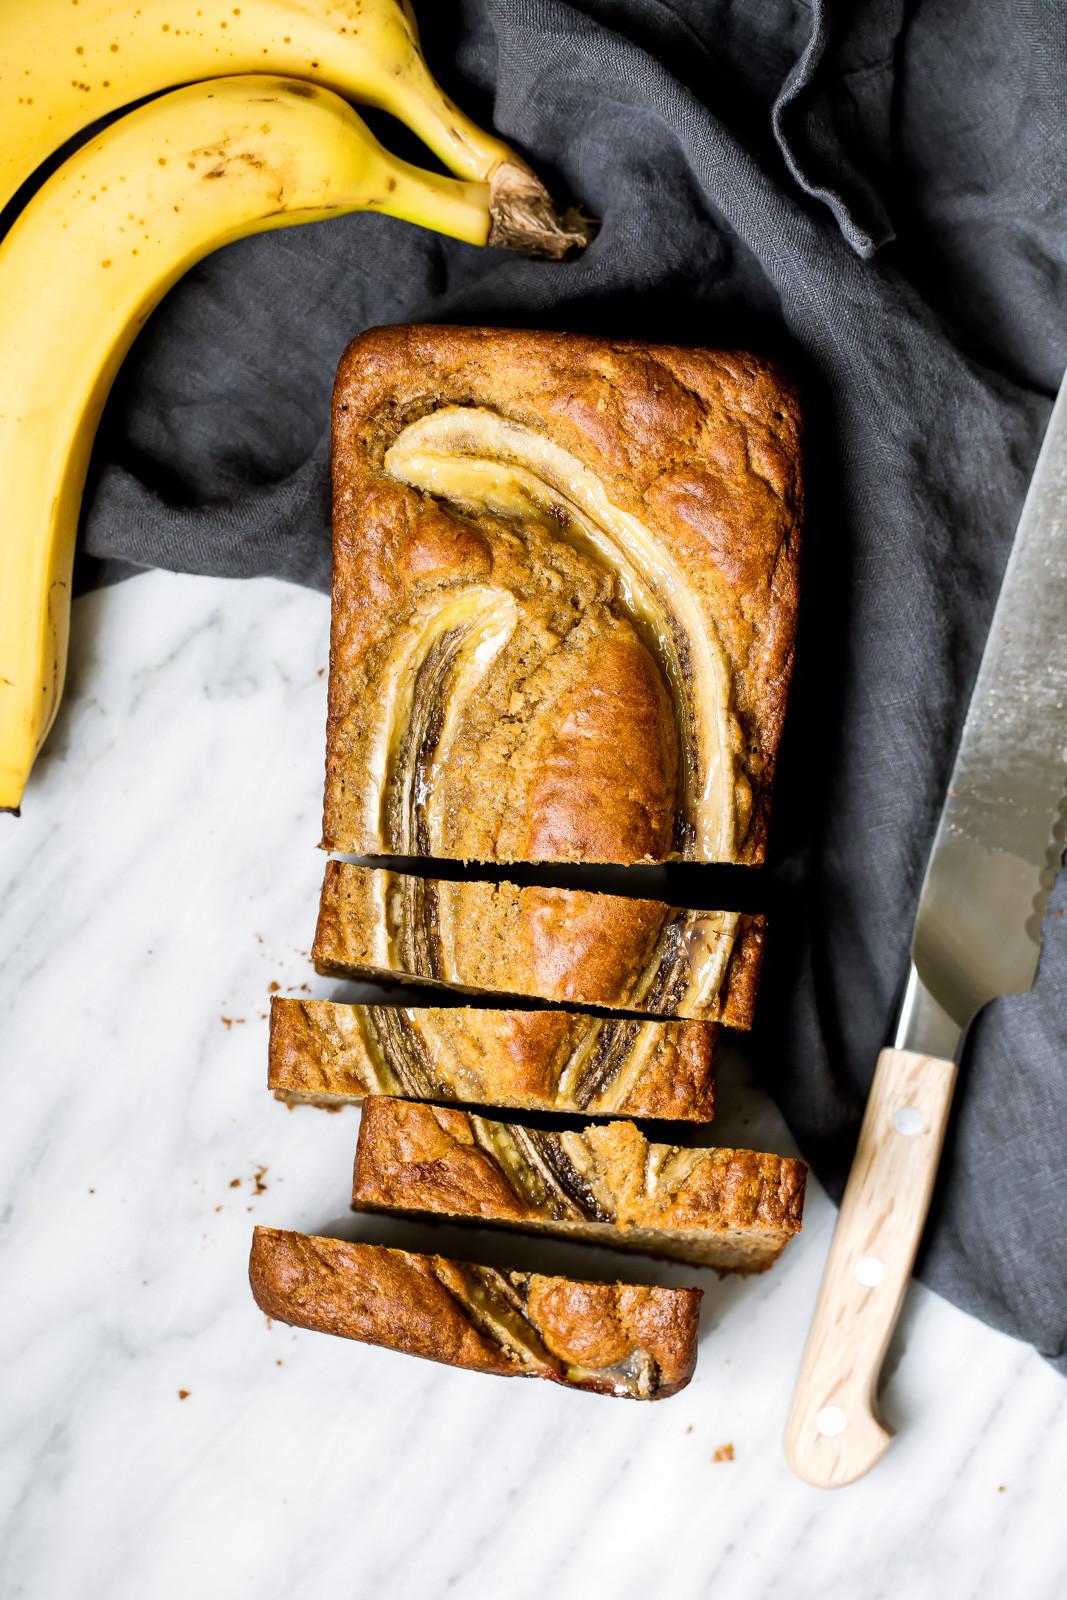 Baking Healthy Bread  My Favorite Healthy Banana Bread Recipe why baking is